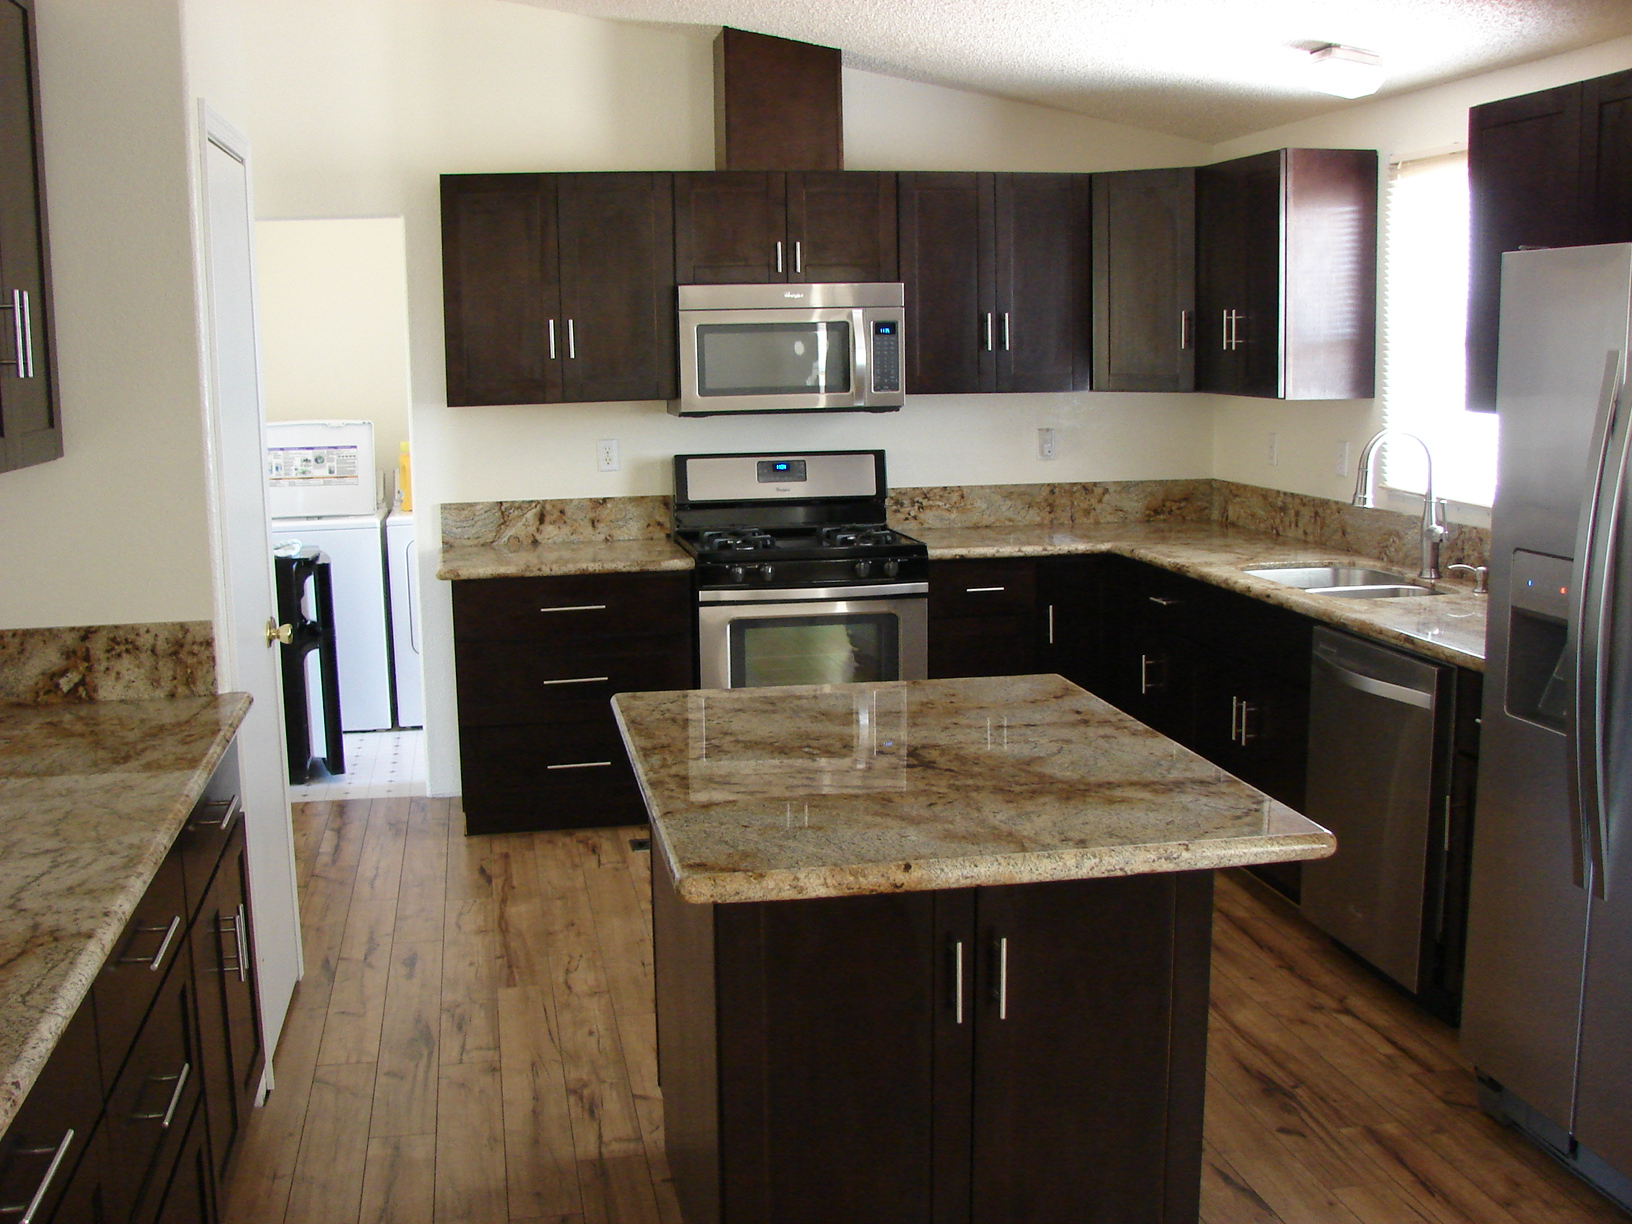 average cost for granite counter tops Phoenix 2014